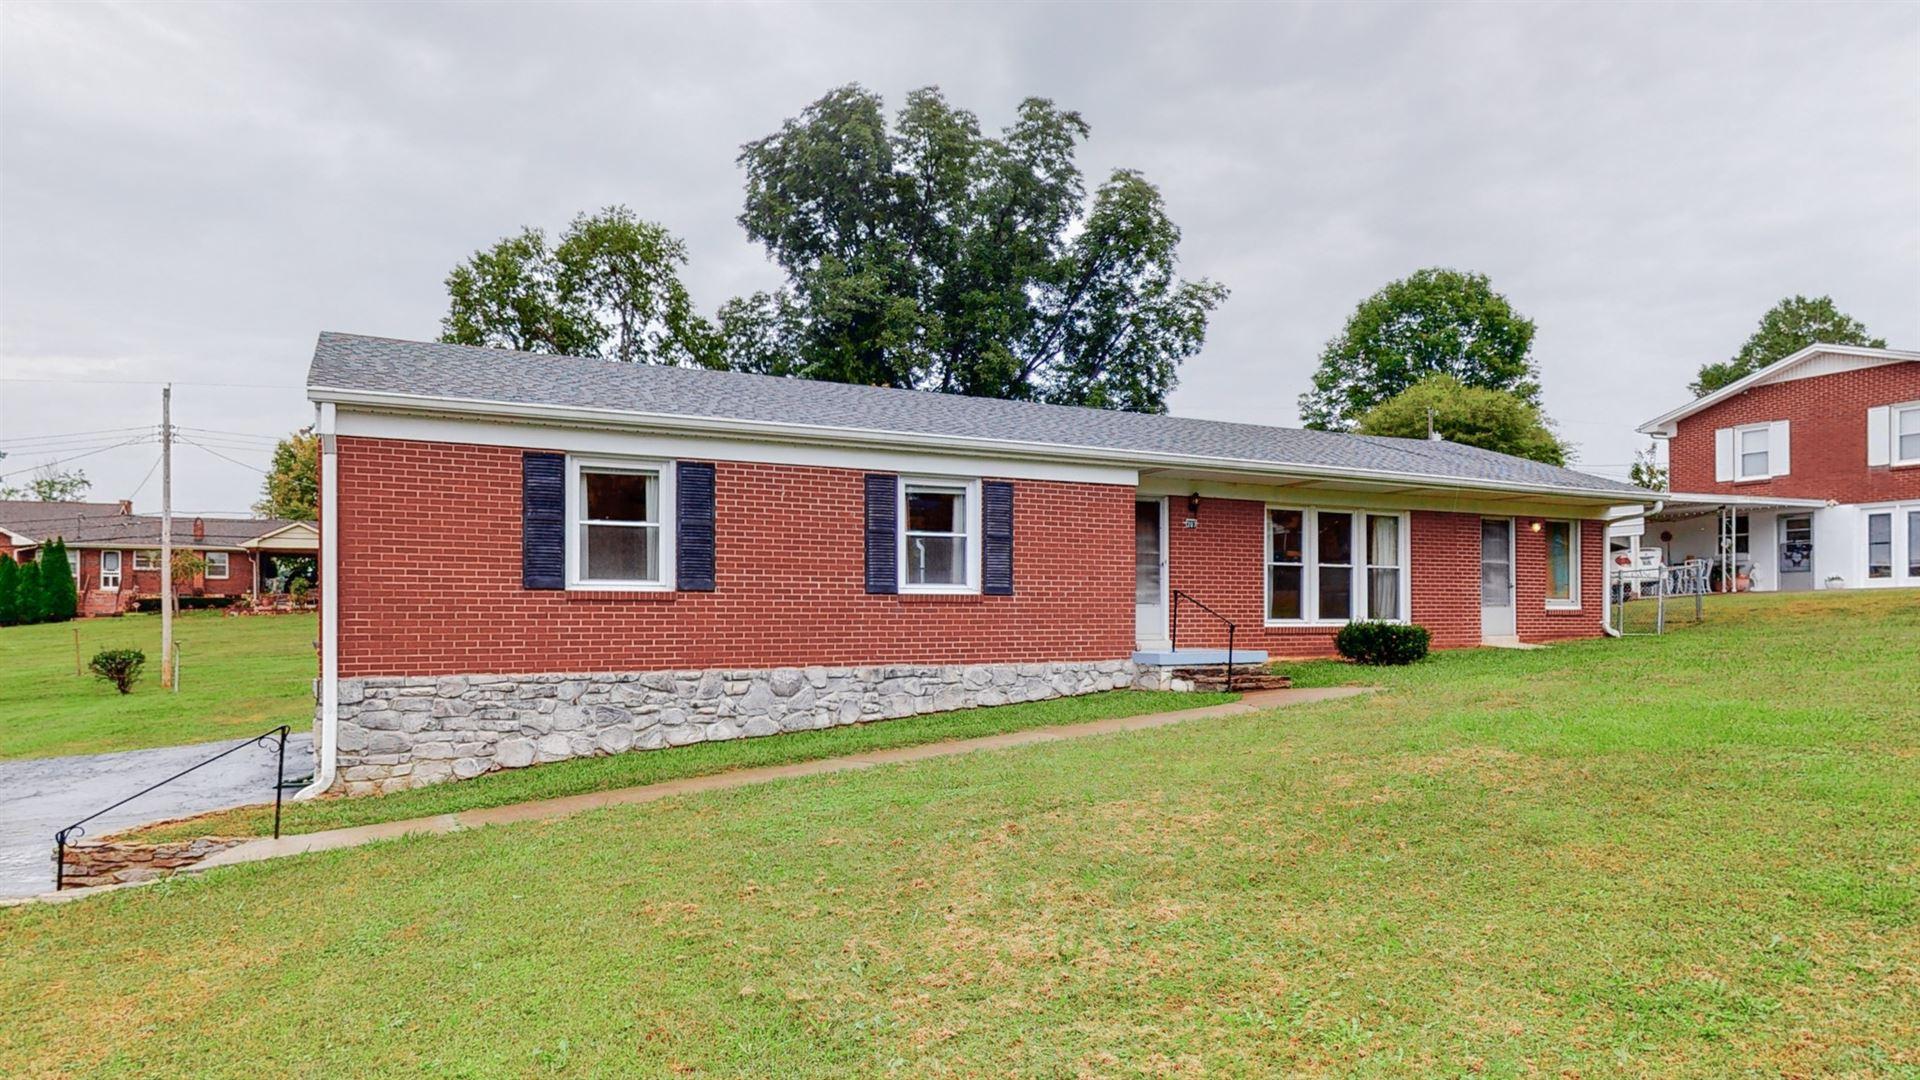 207 Crestland Dr, Columbia, TN 38401 - MLS#: 2197901